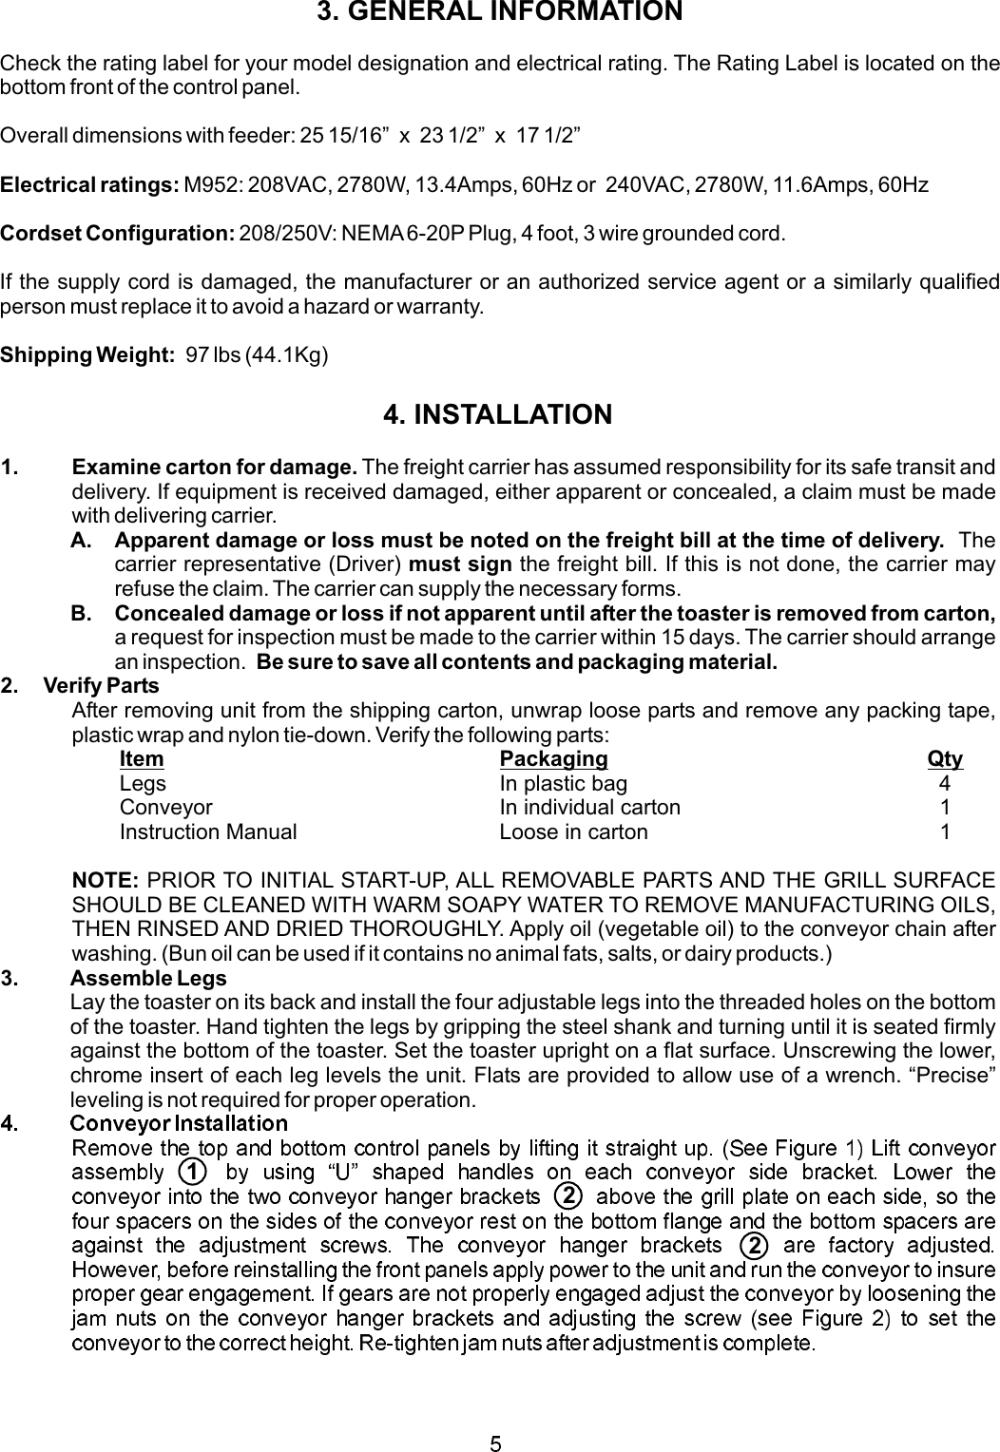 medium resolution of page 5 of 12 apw wyott apw wyott m95 2